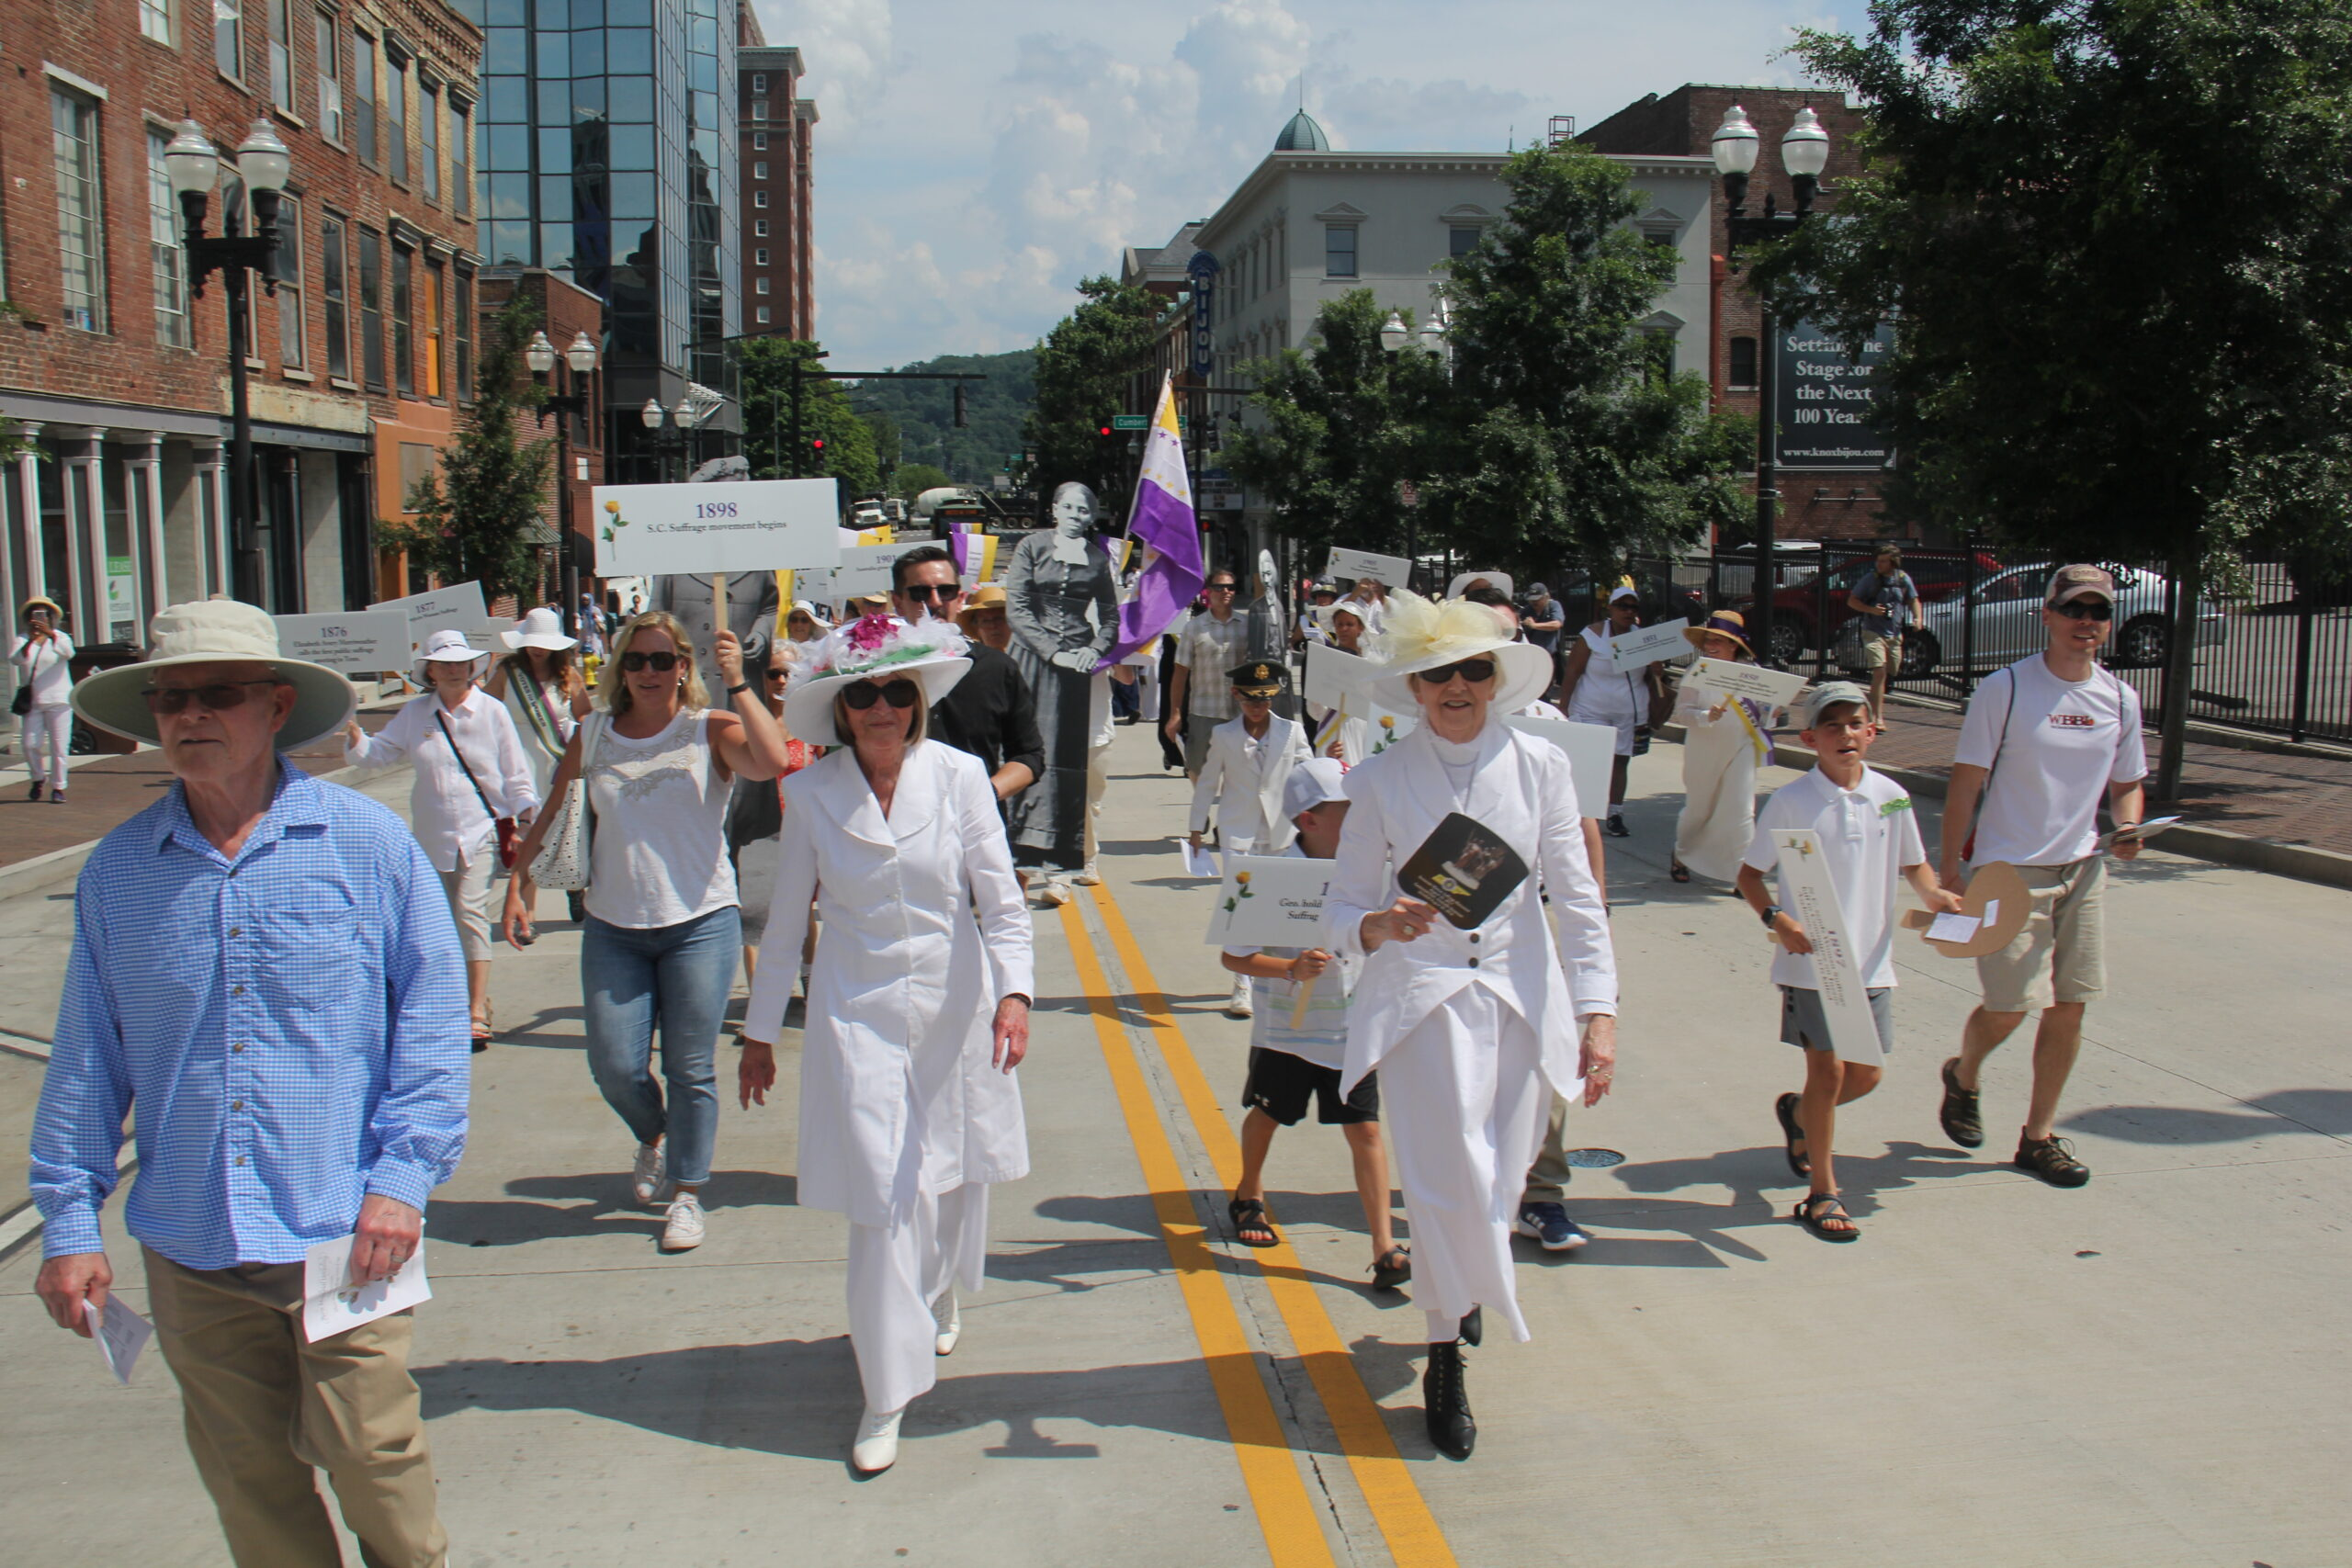 Suffrage Coalition Parade